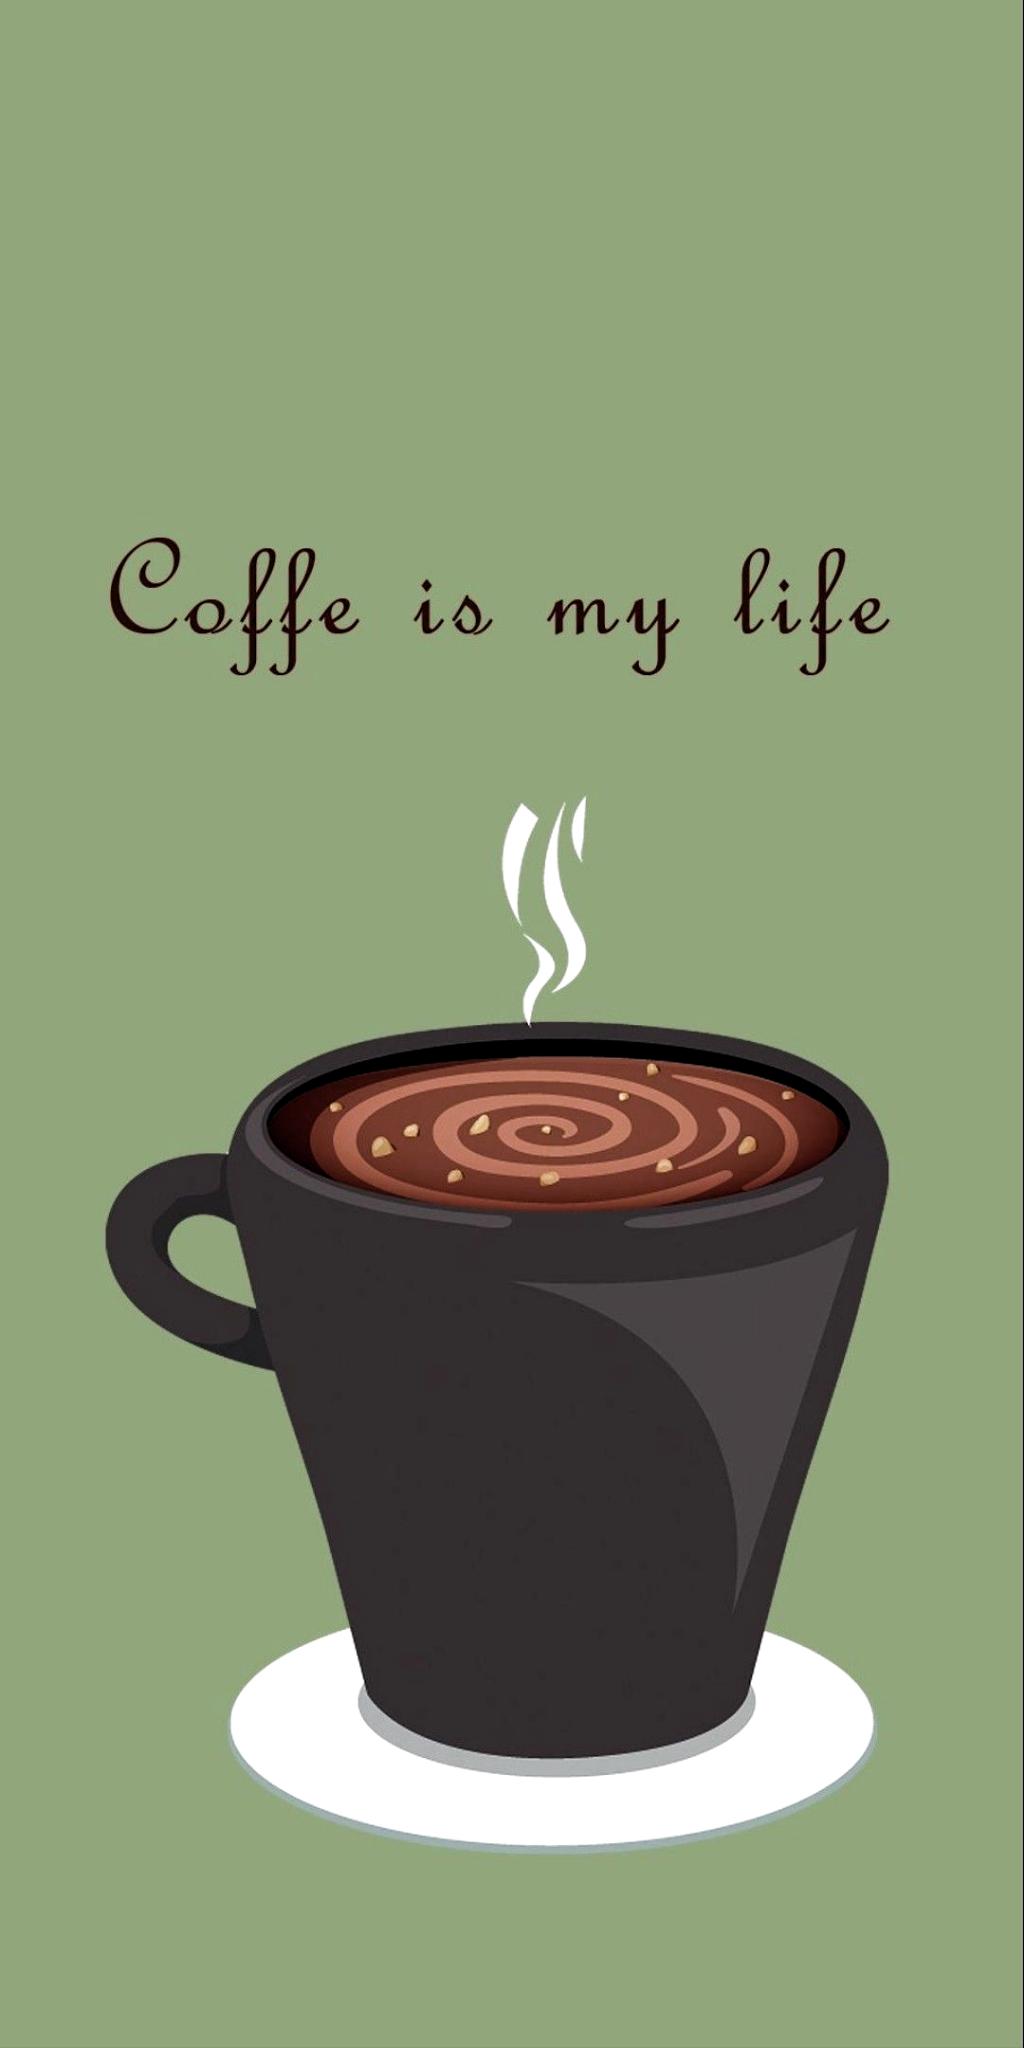 18bagelsco Coffee Latte Mocha Procaffeinating Caffeine Cup Of Joe Java Coffee Shop Bari Coffee Wallpaper Iphone Coffee Jokes Aesthetic Coffee